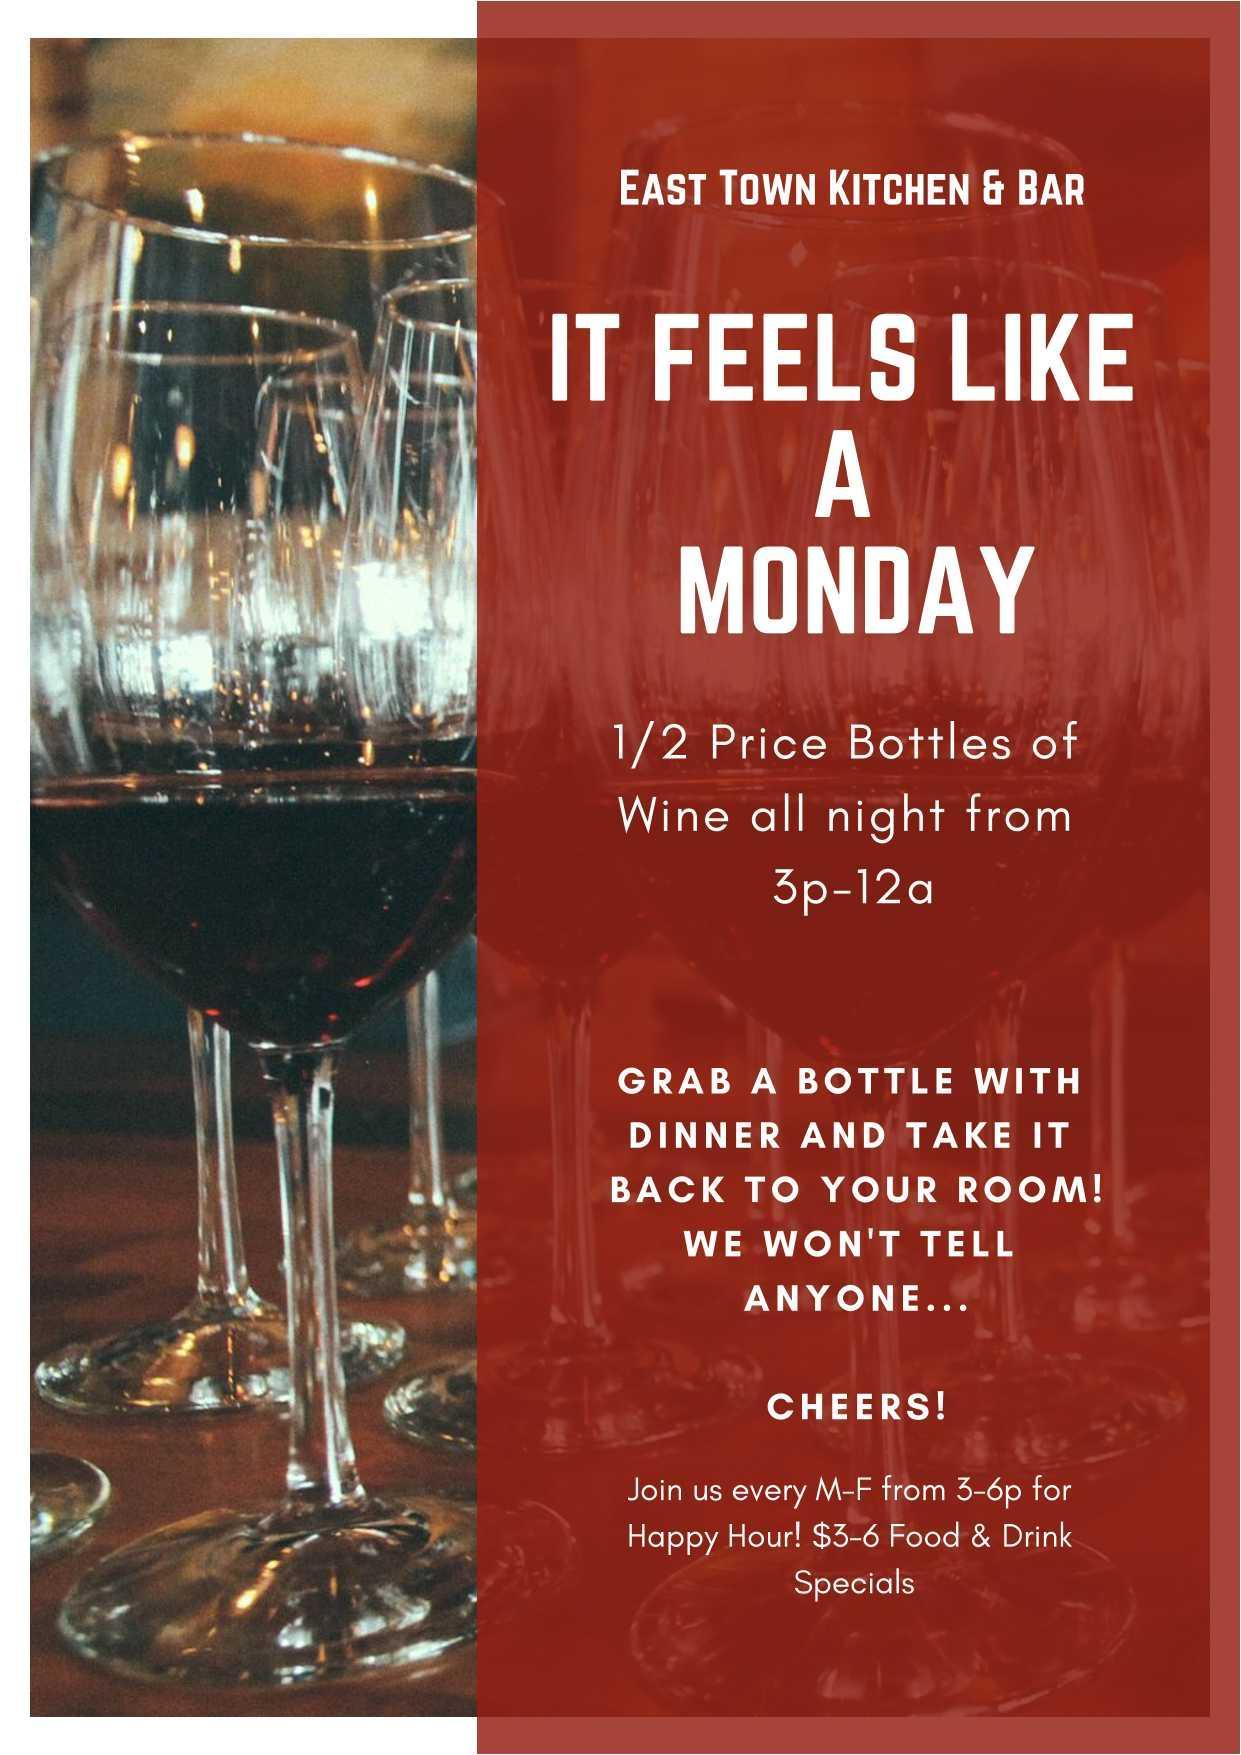 Wine Specials on Mondays